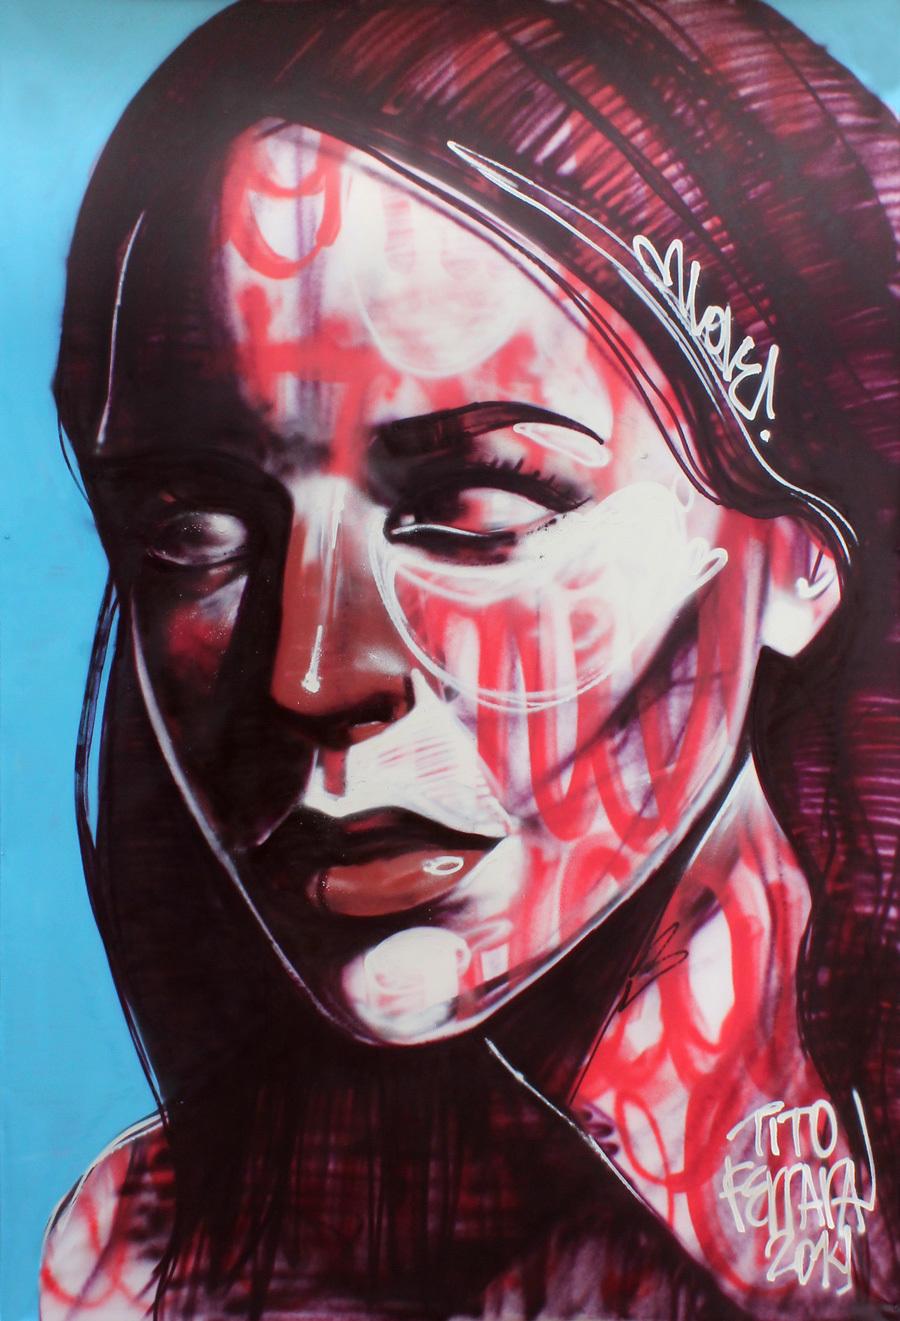 tito-ferrara-graffiti-pintura-sp-arte-de-rua-28